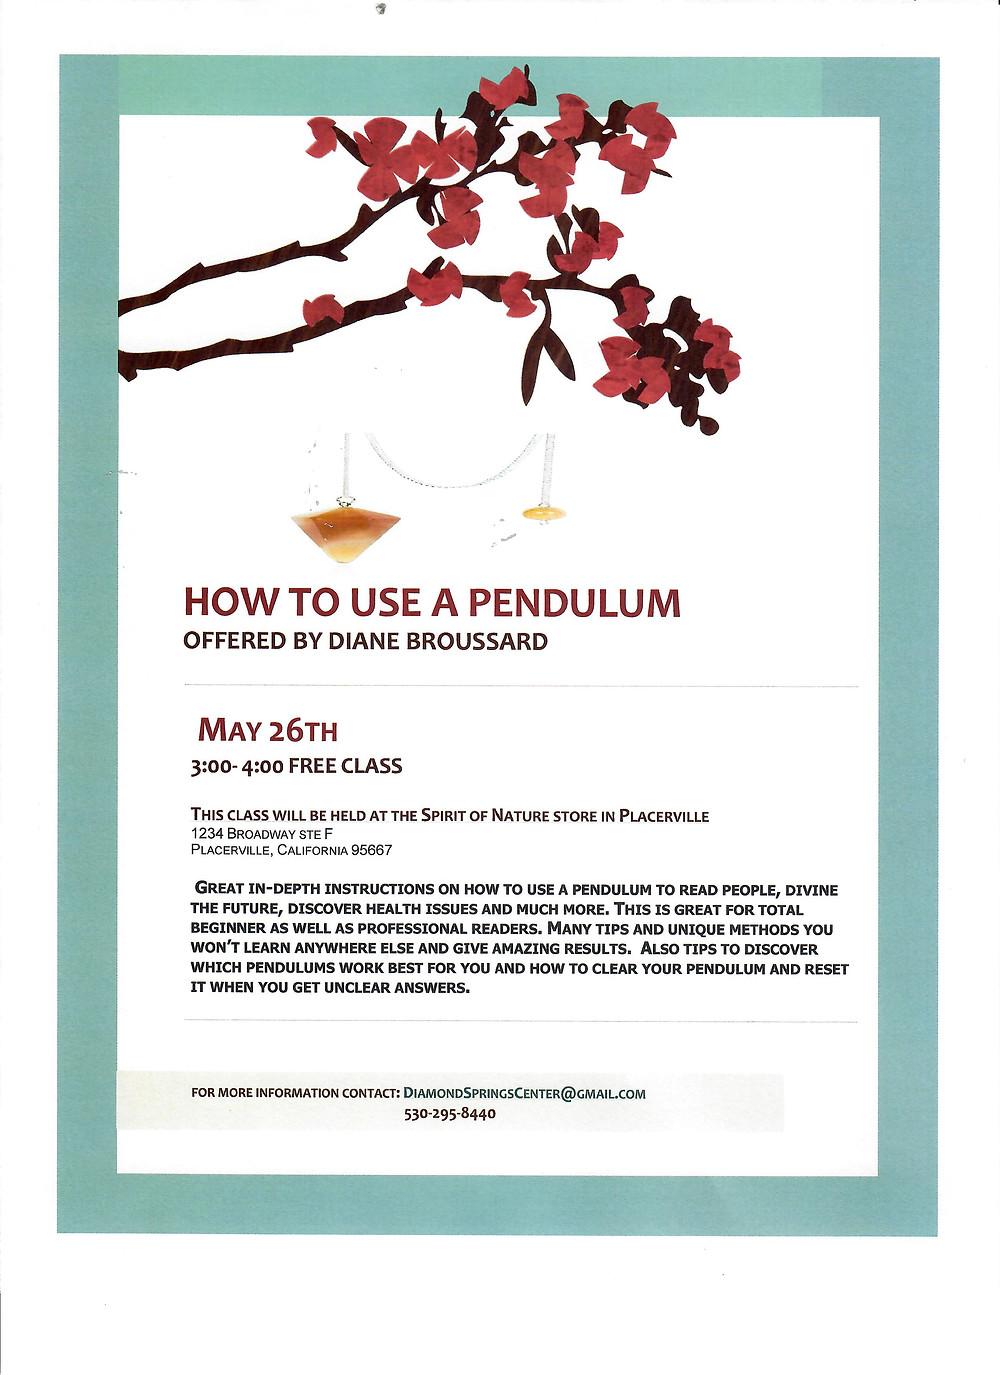 Free Pendulum Class